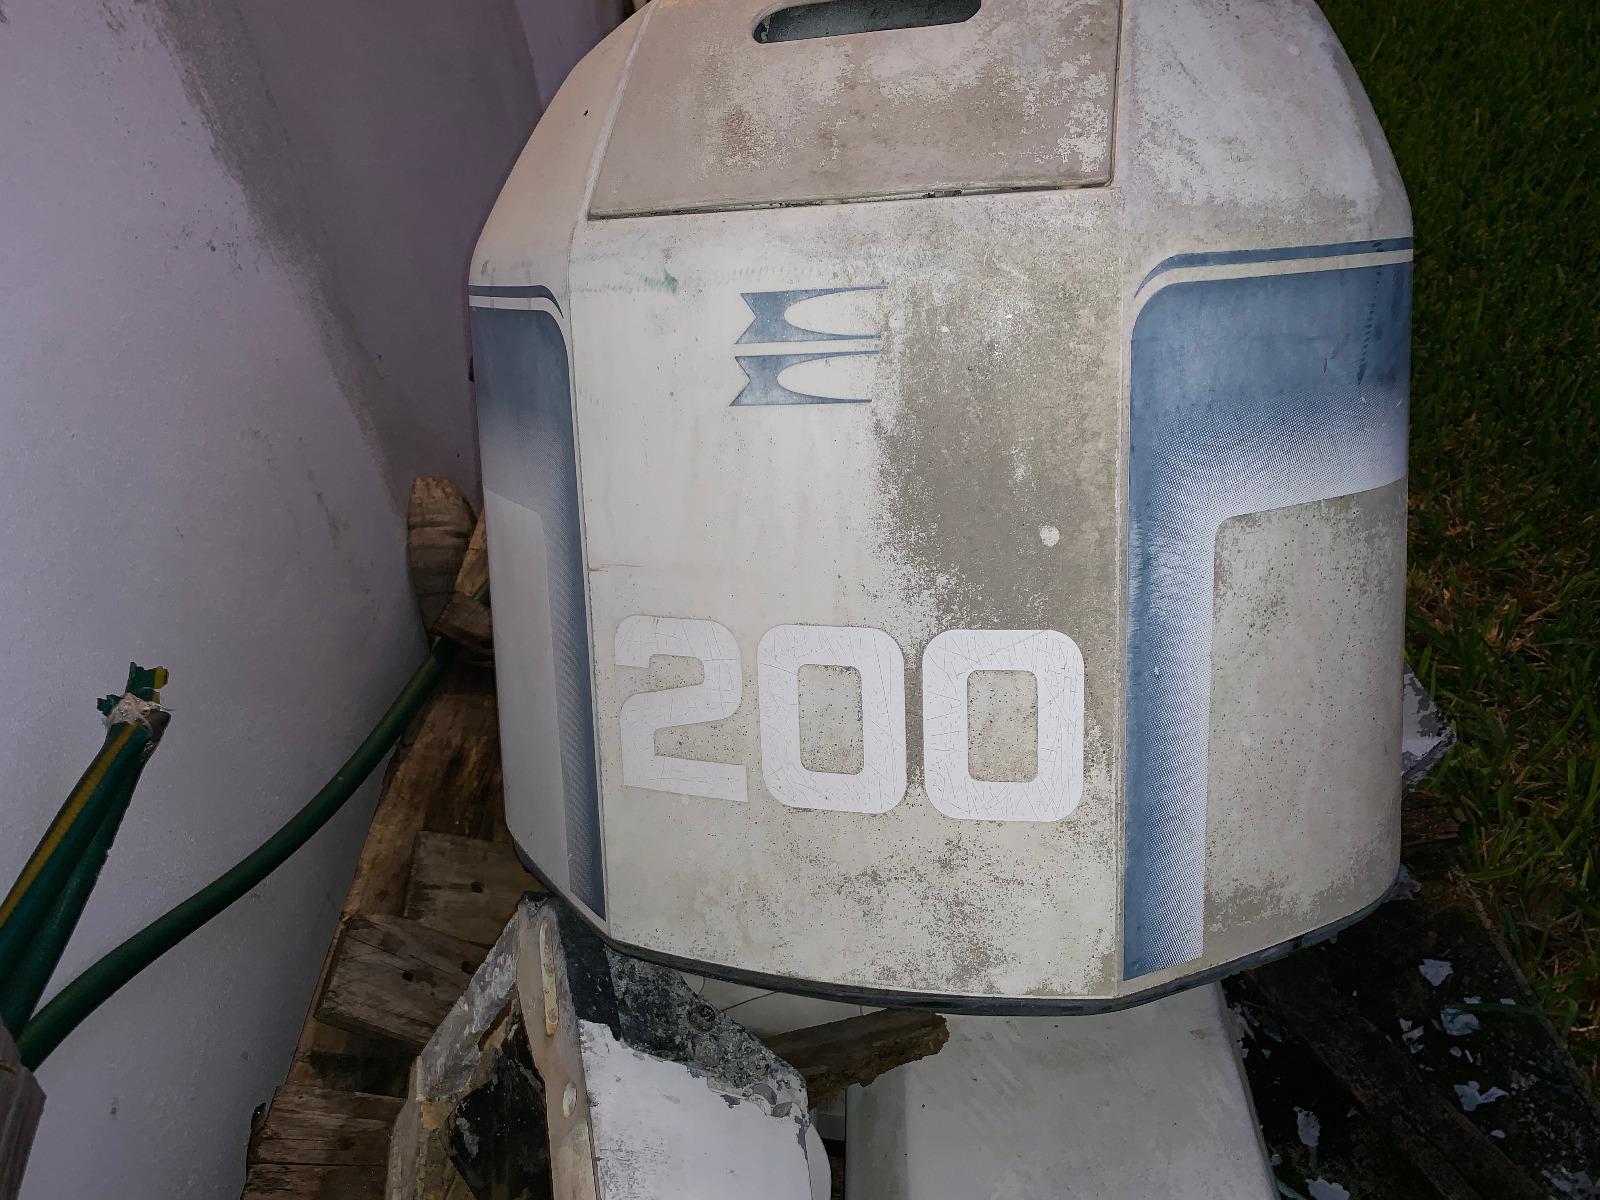 Evinrude Ocean Pro 200 (Parts)